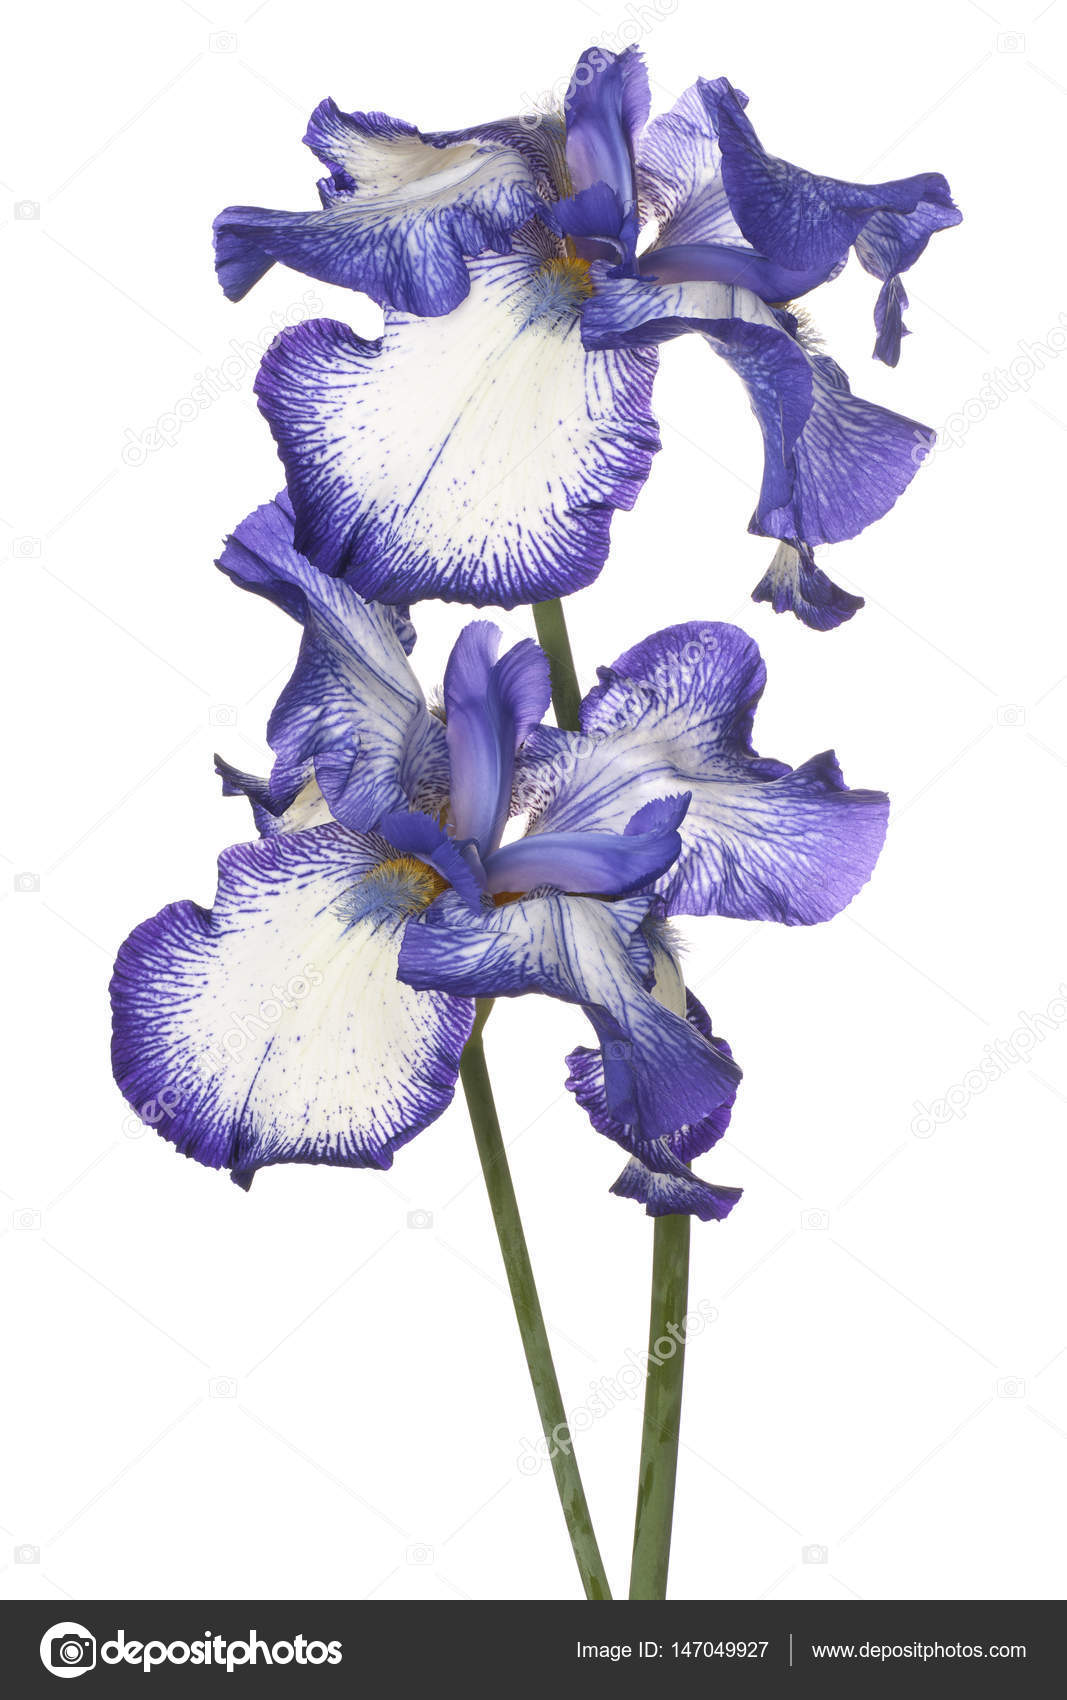 Iris flower isolated stock photo vilor 147049927 iris flower isolated stock photo izmirmasajfo